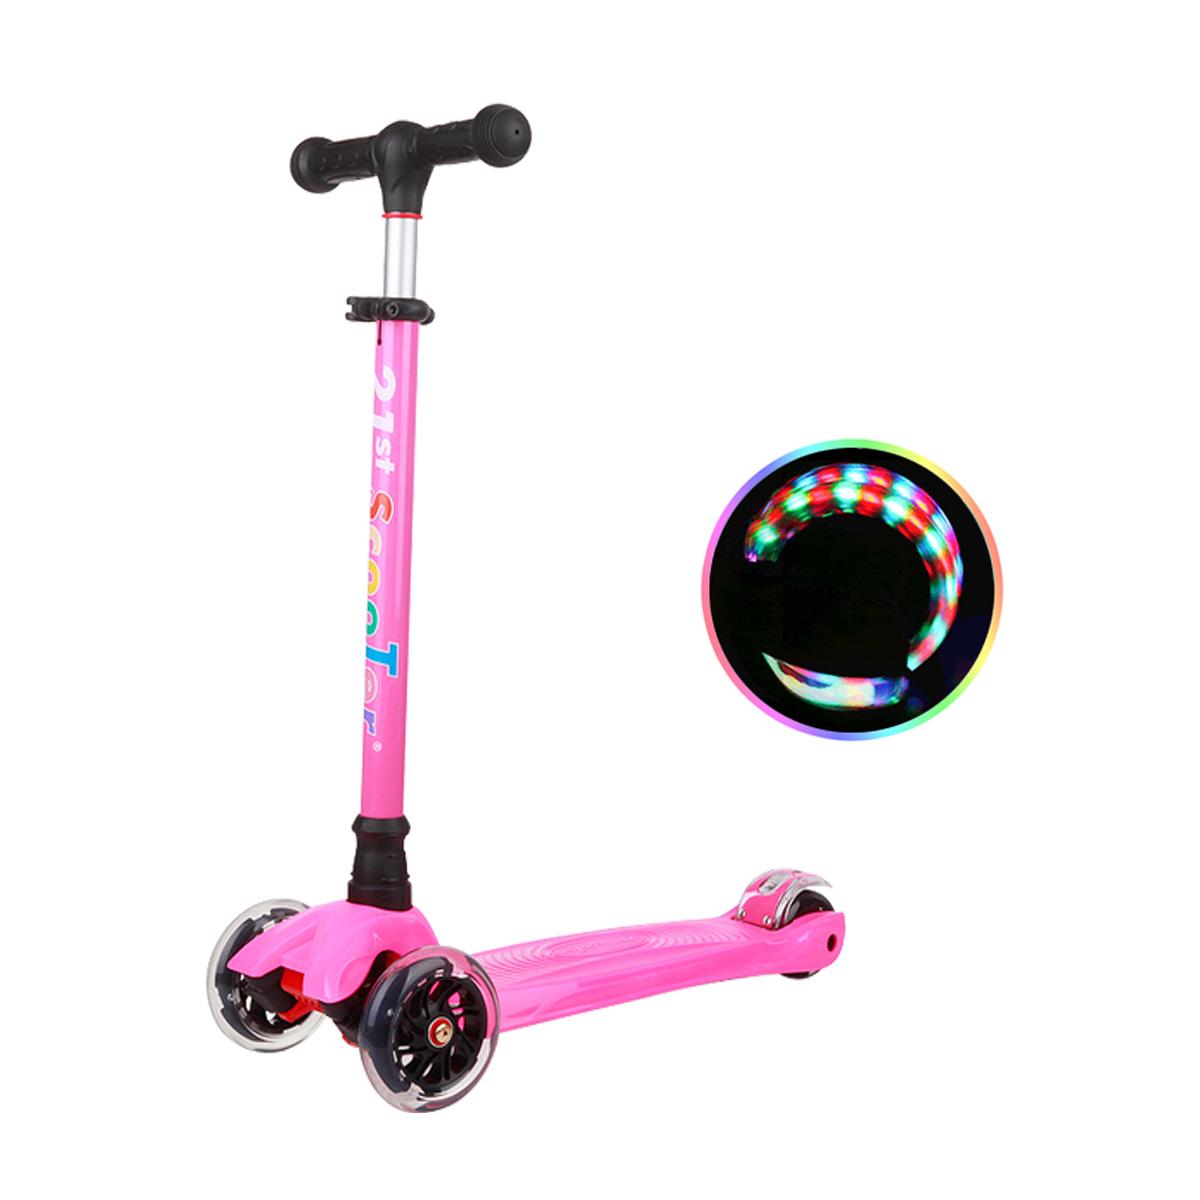 21st ScooTer 아동용 킥보드, 02_21st scooter 컬러플 착탈식 분홍.